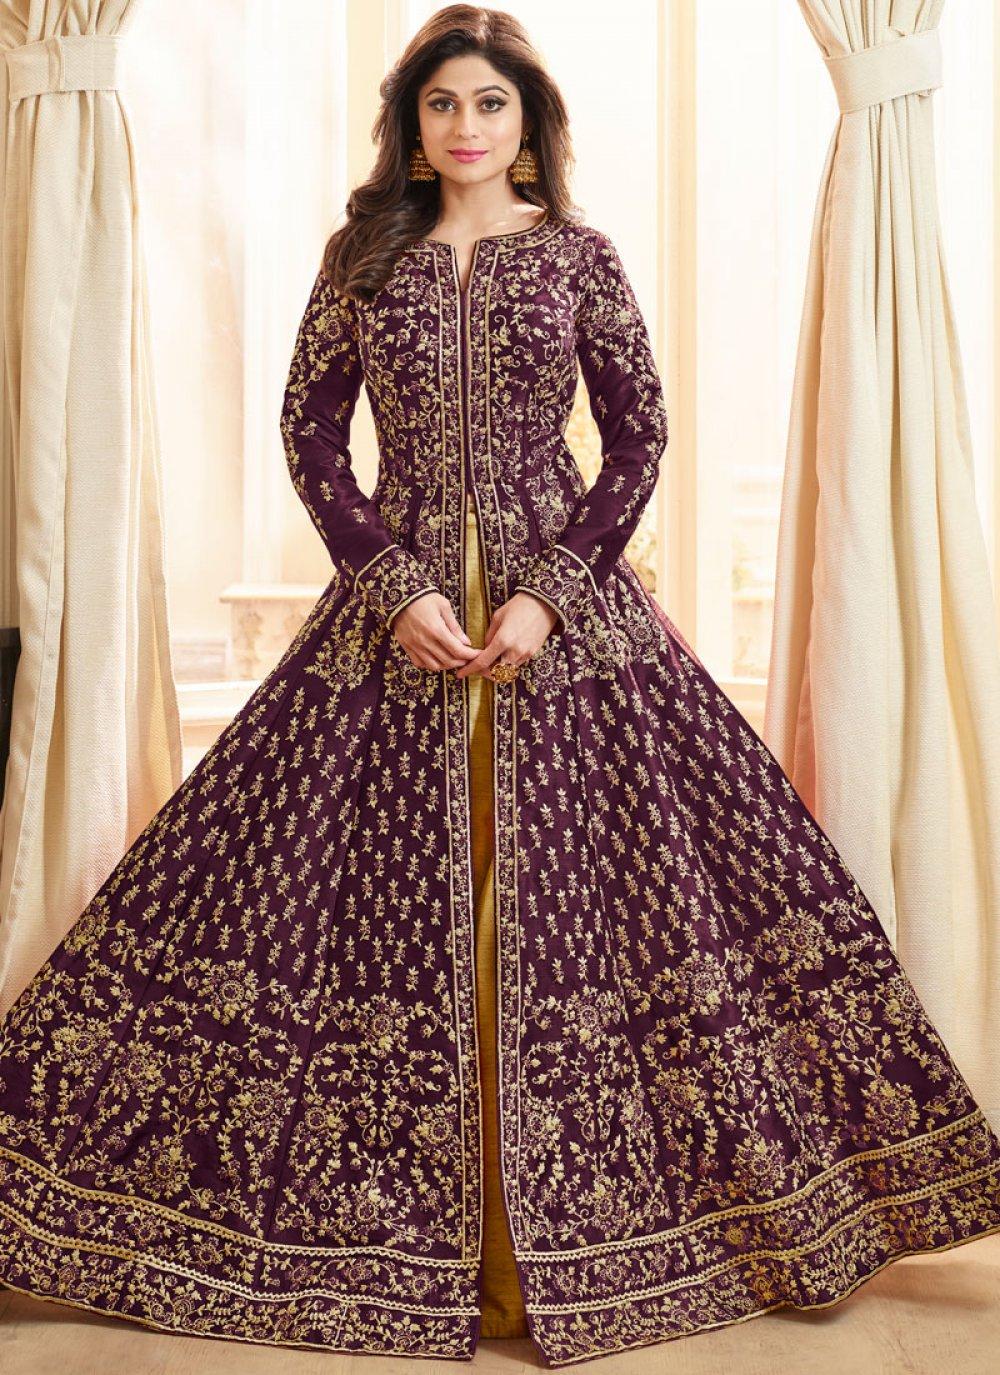 Shamita Shetty Art Silk Embroidered Long Choli Lehenga